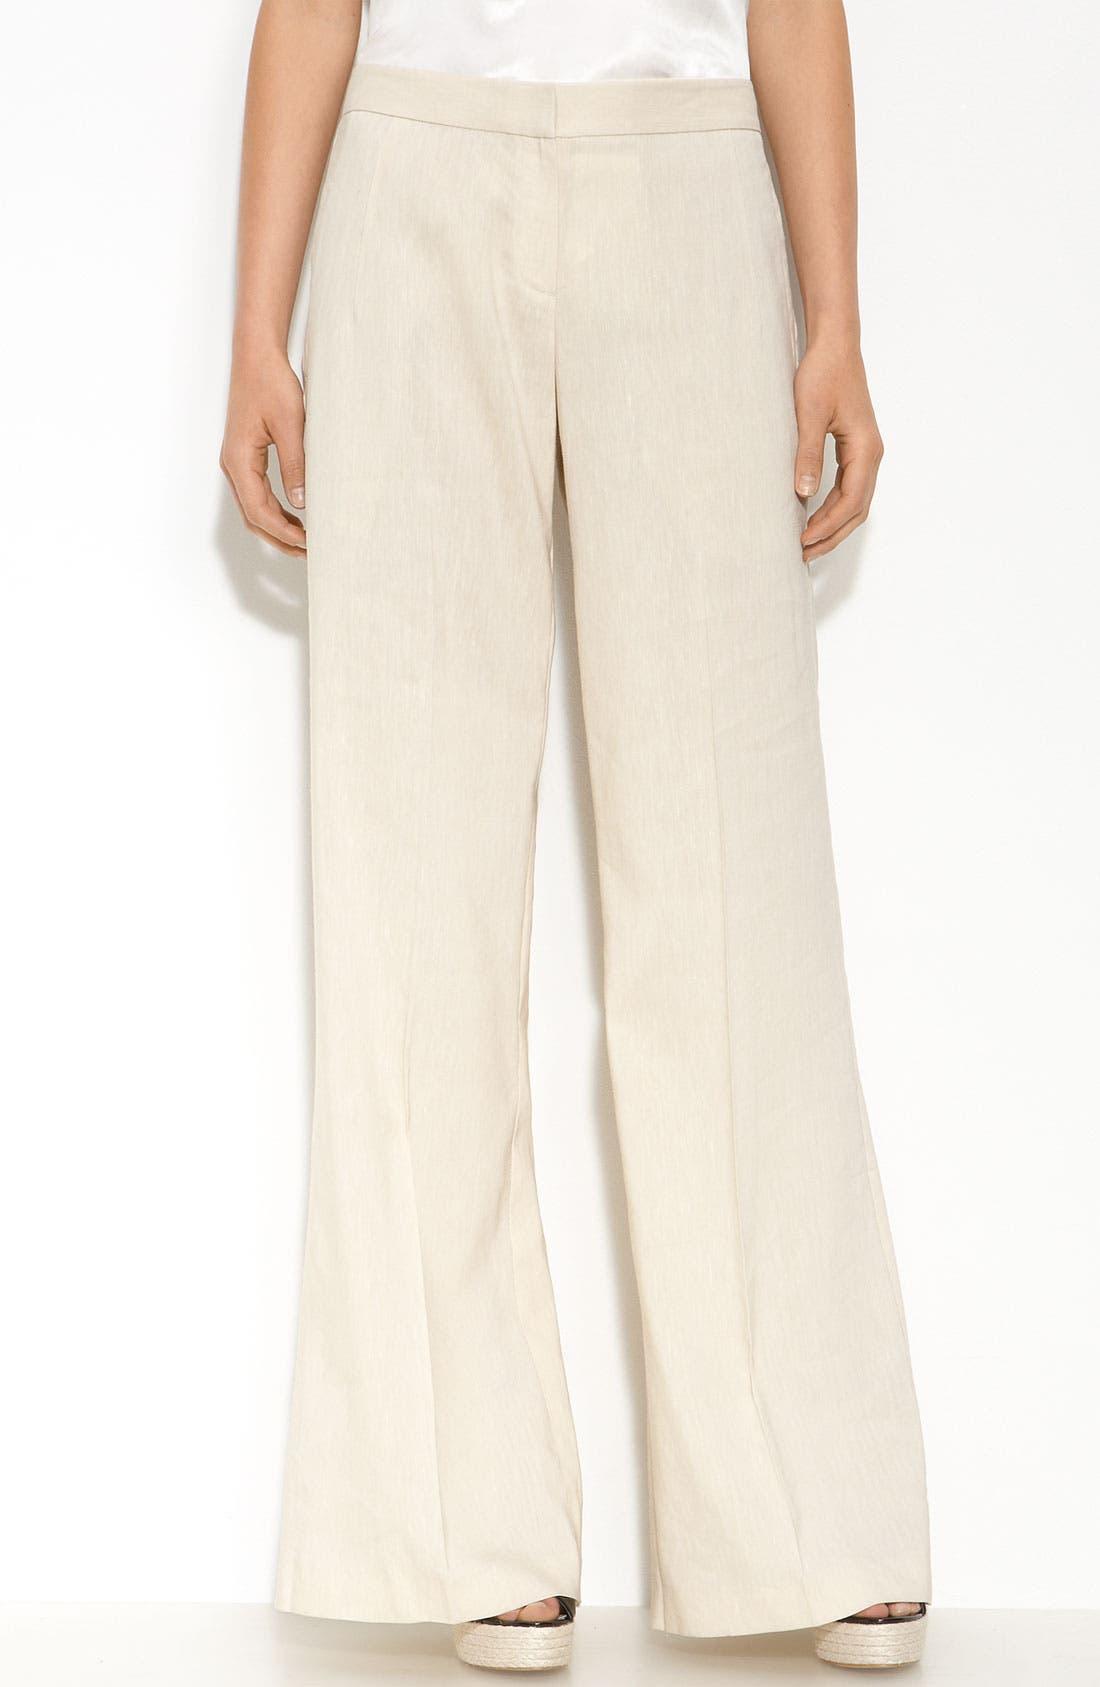 THEORY 'Fyran - Wool Crunch' Pants, Main, color, 270